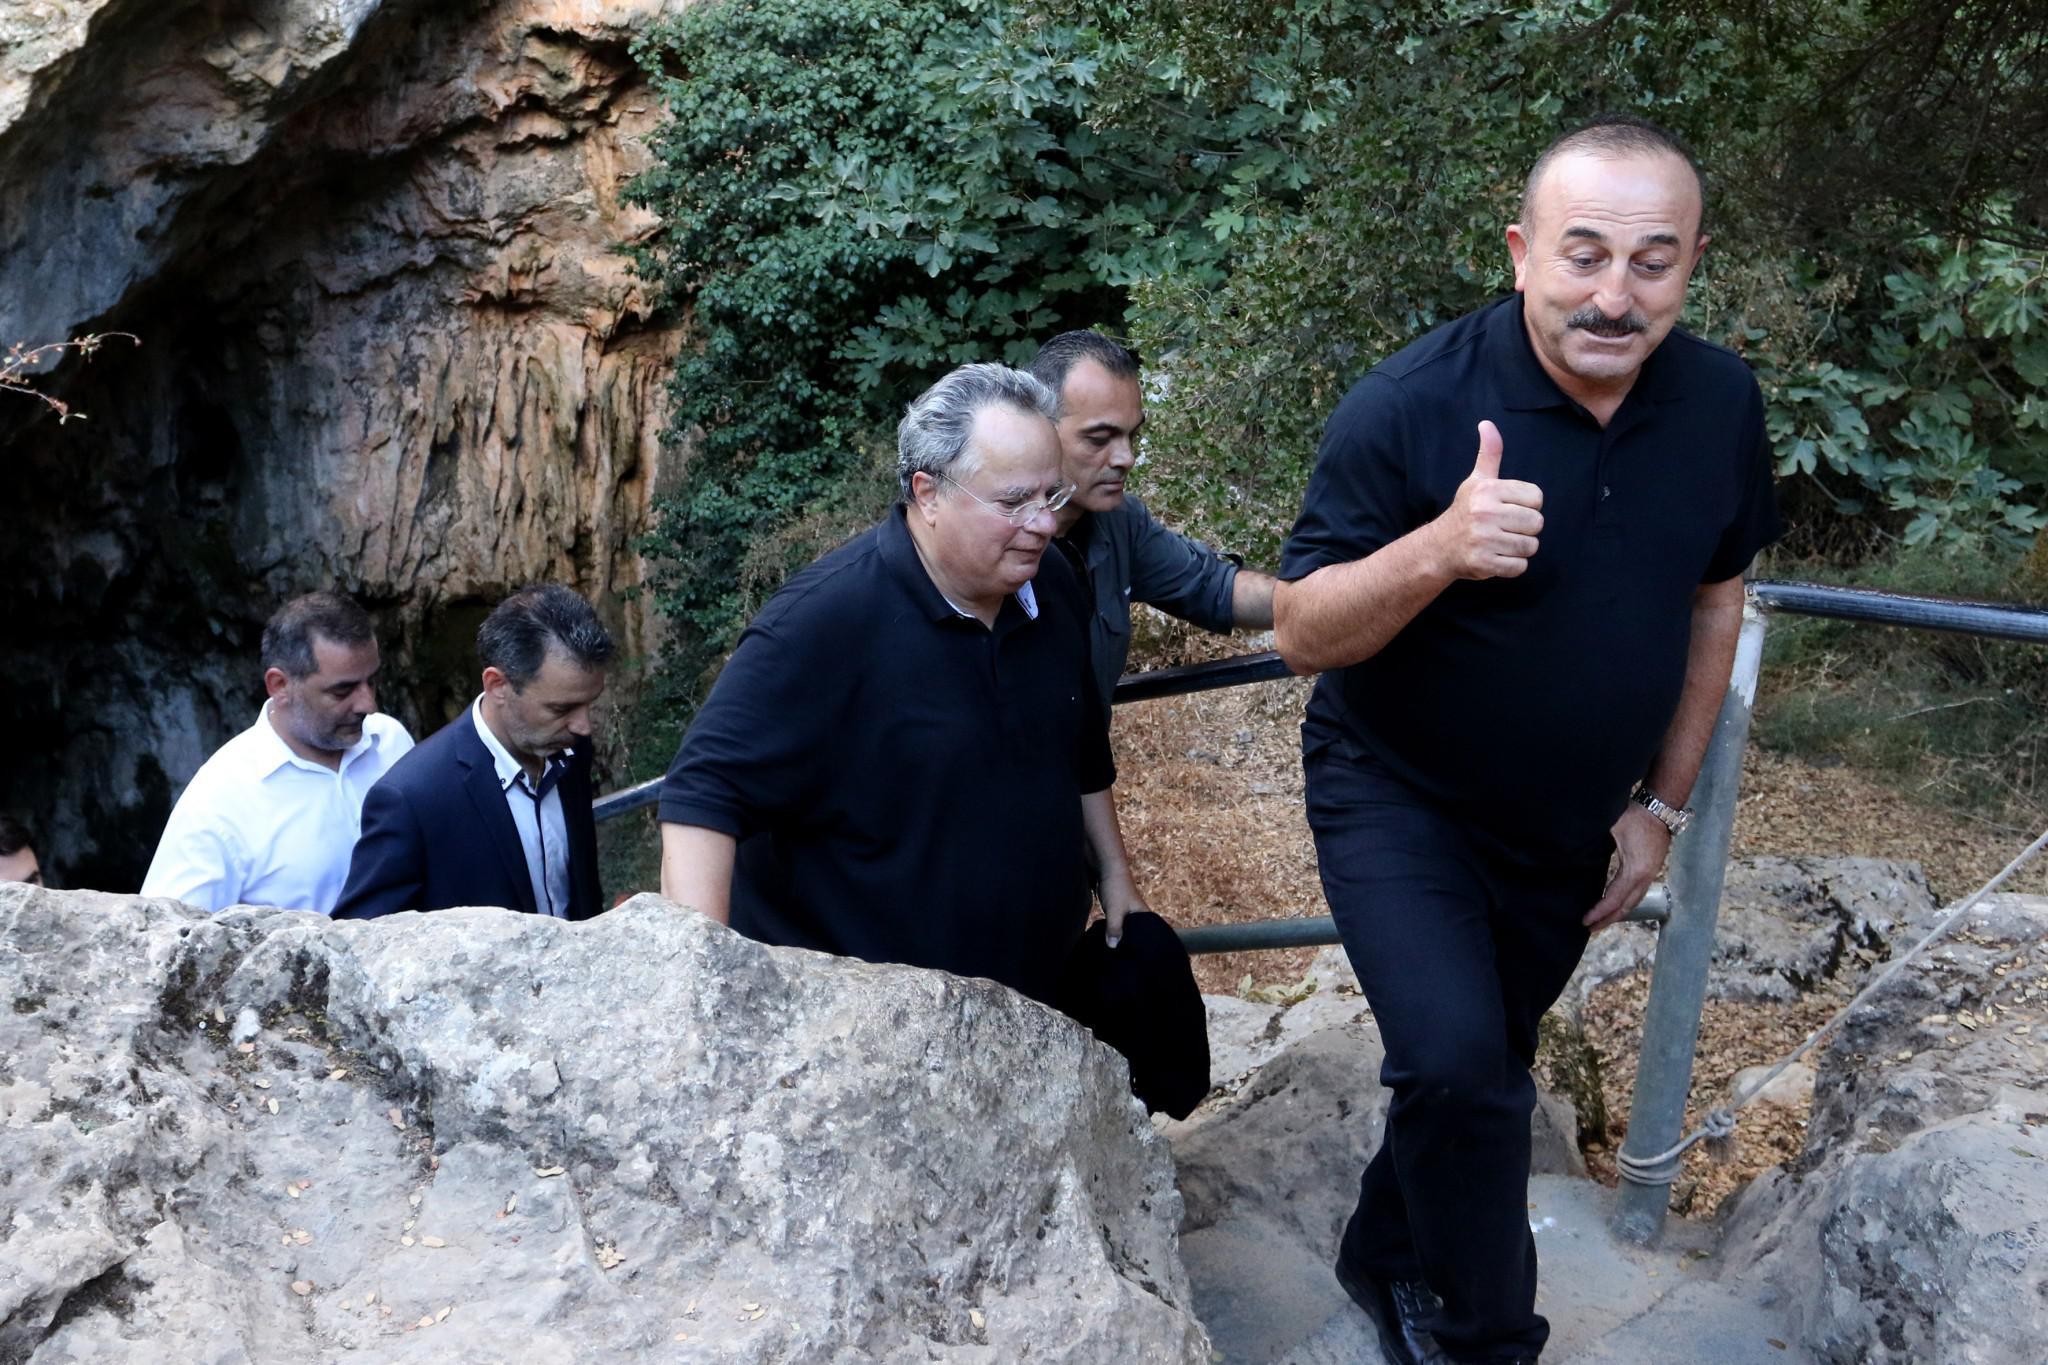 tsavousoglou-kotsiaz-1000 Τα... ελληνικά του Τσαβούσογλου και το «ευχαριστώ» για τη φιλοξενία στην Κρήτη [εικόνες]